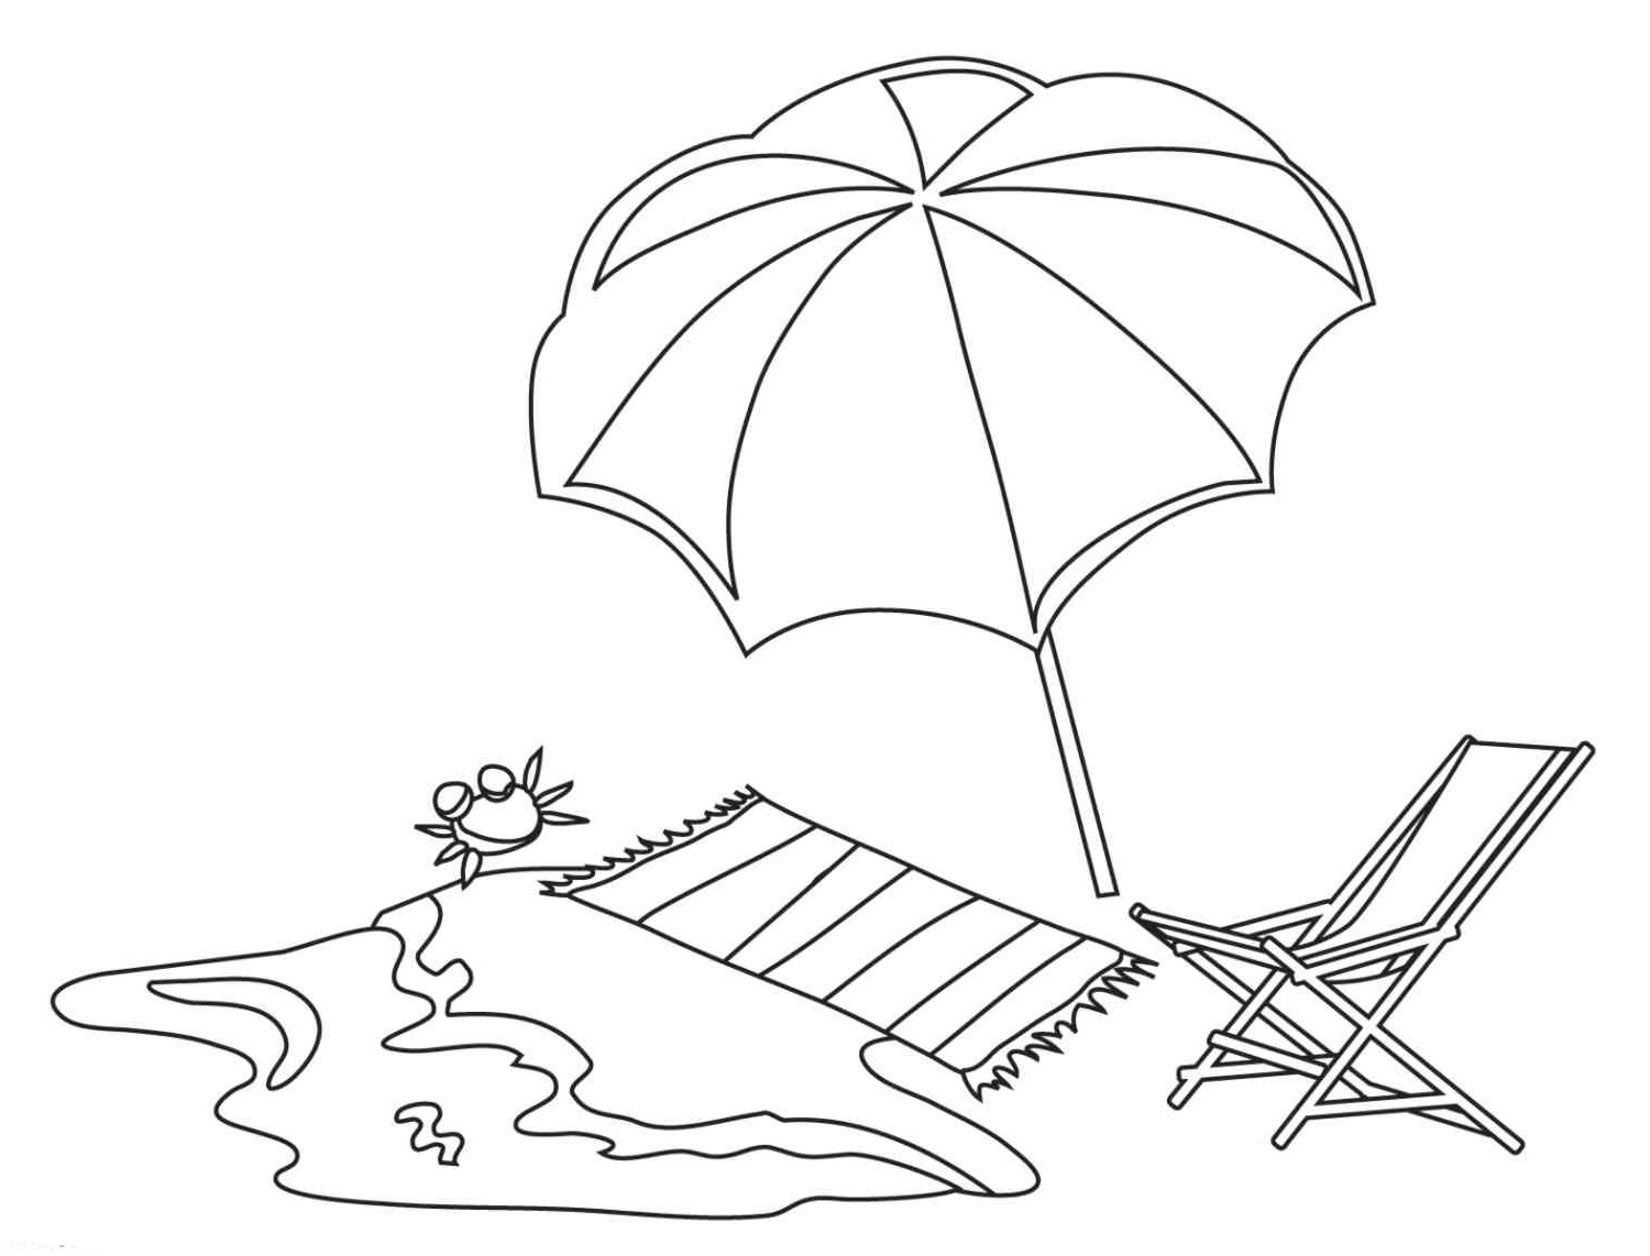 dibujo tumbona playa para colorear - Buscar con Google | Dibuixos ...